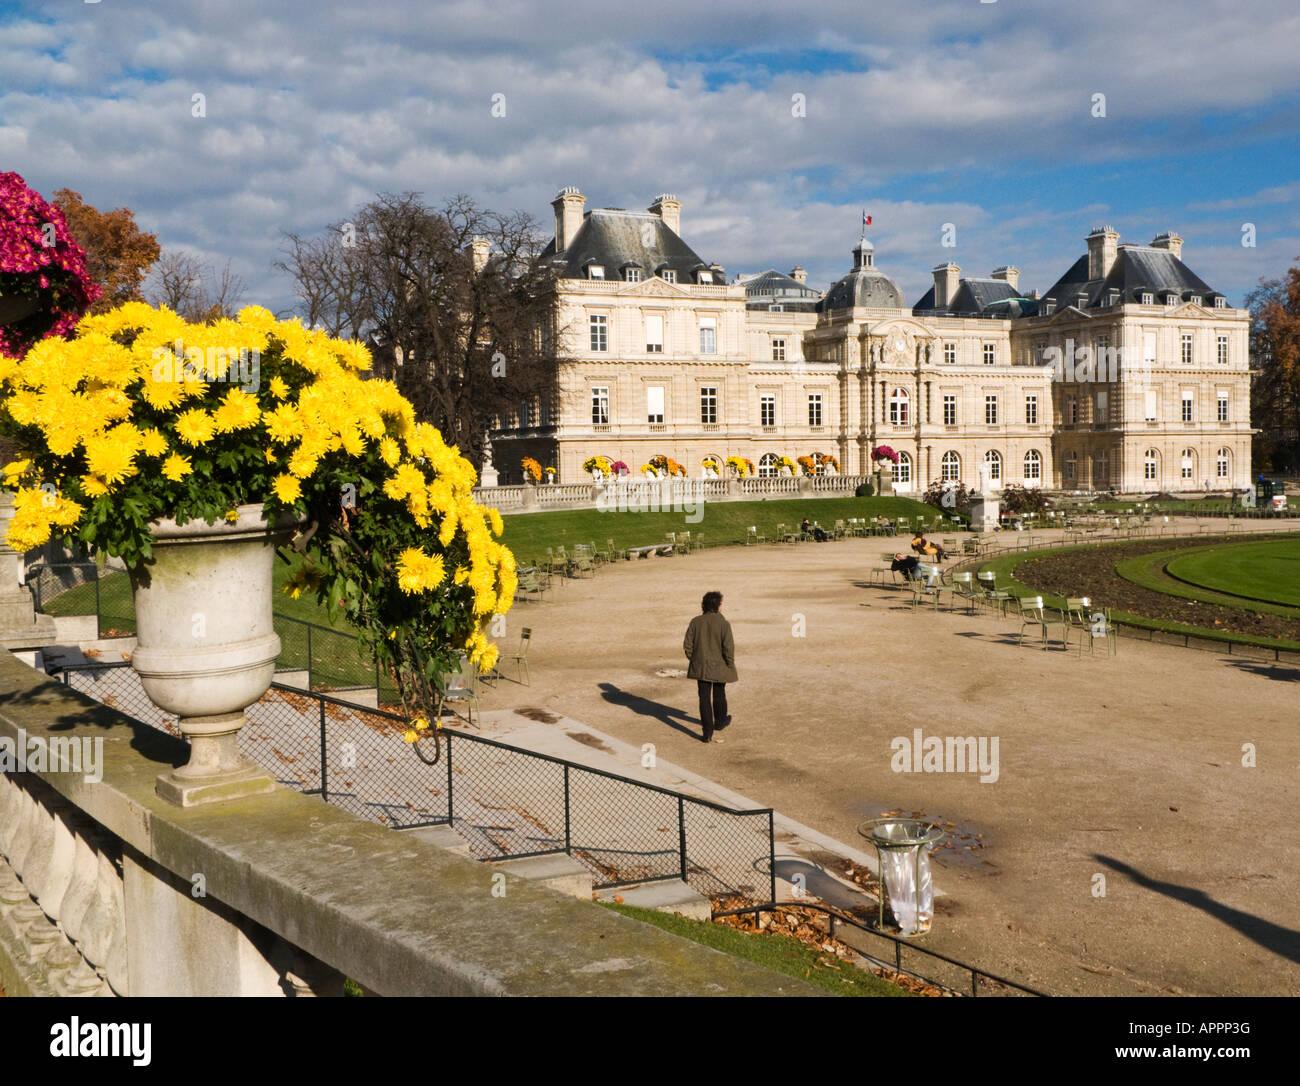 Jardin du Luxembourg, Paris - Stock Image